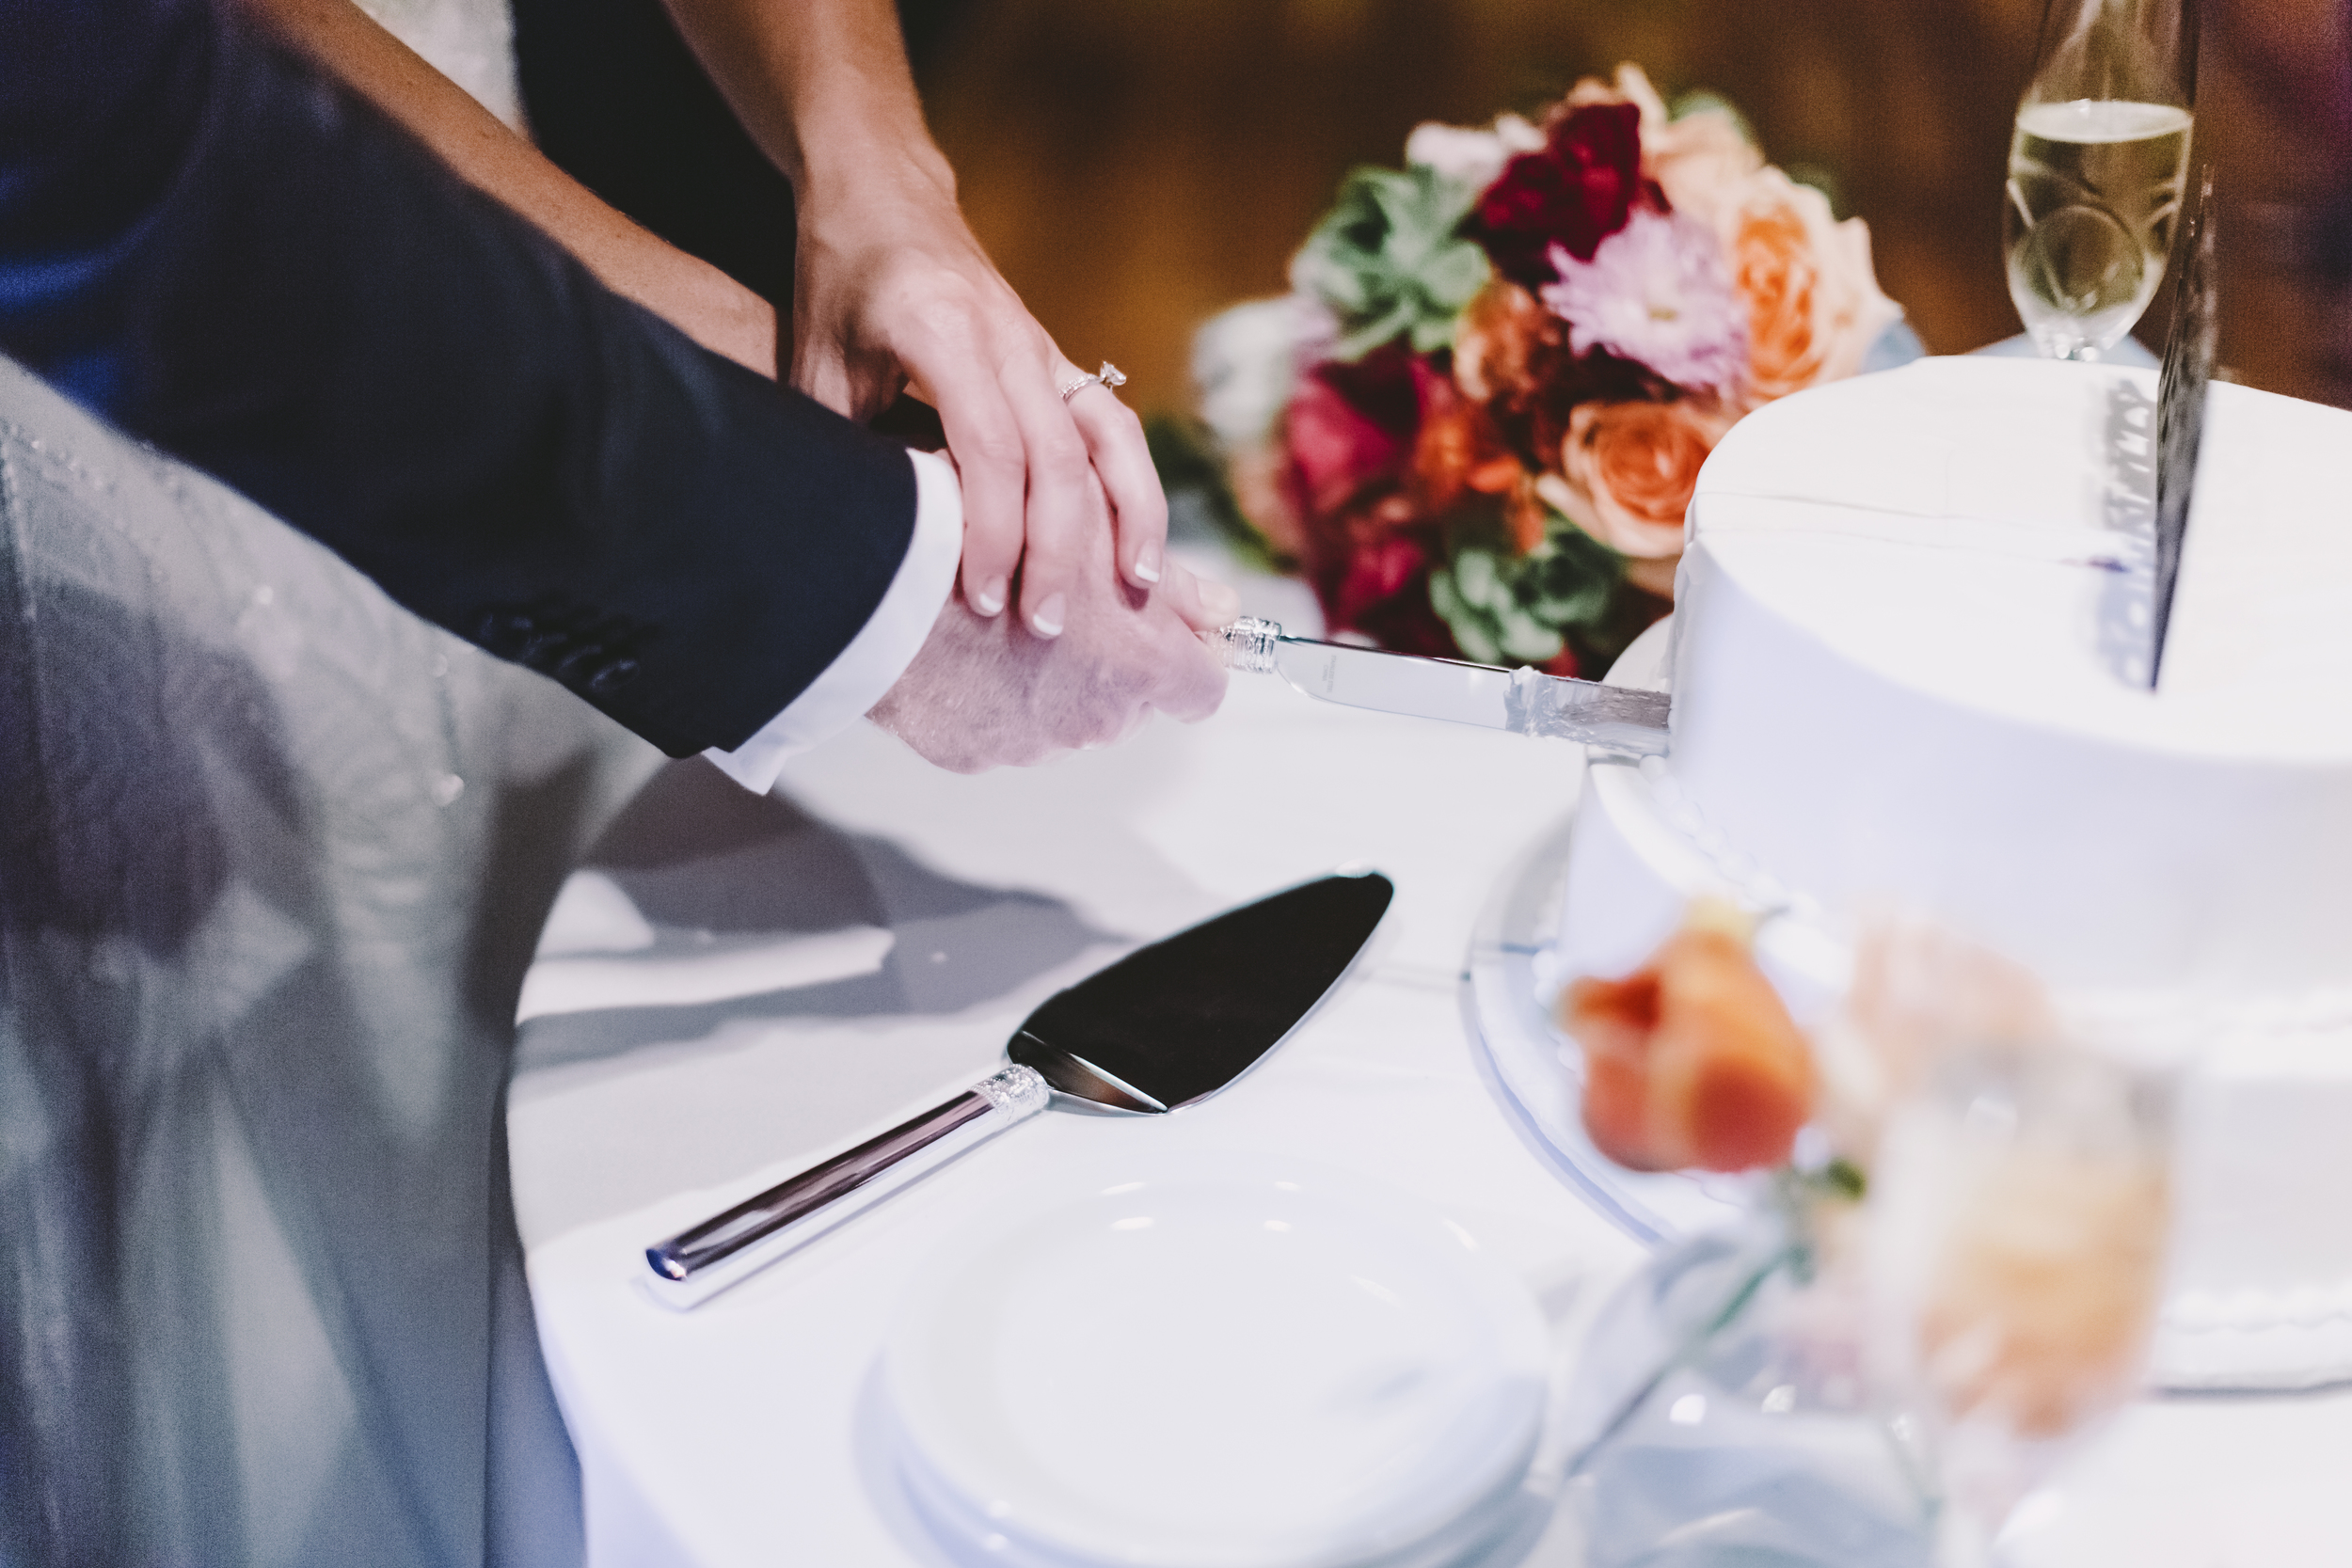 angie-diaz-photography-maui-wedding-mel-matt-108.jpg